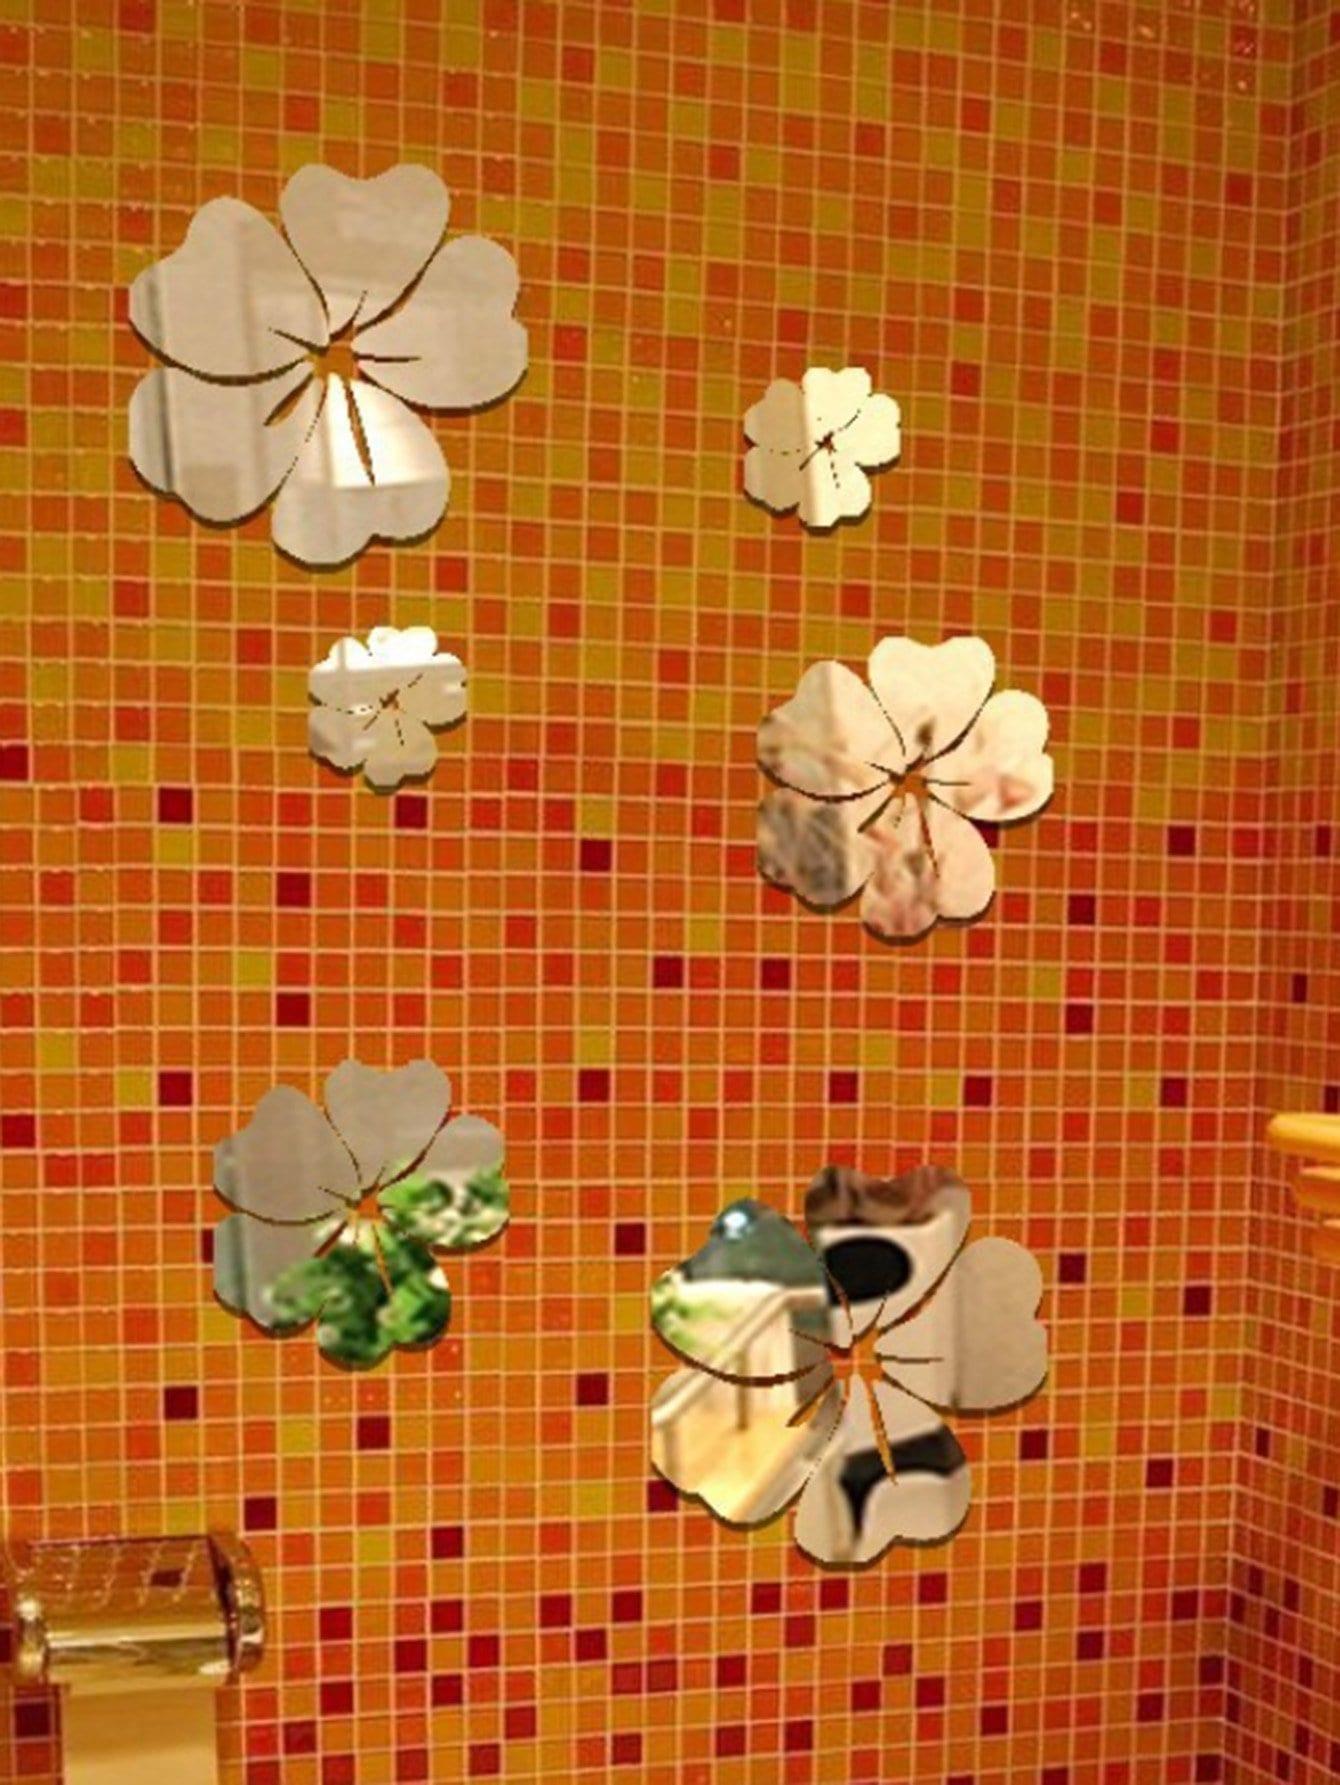 Flower Mirror Wall Sticker Set 5pcs все цены